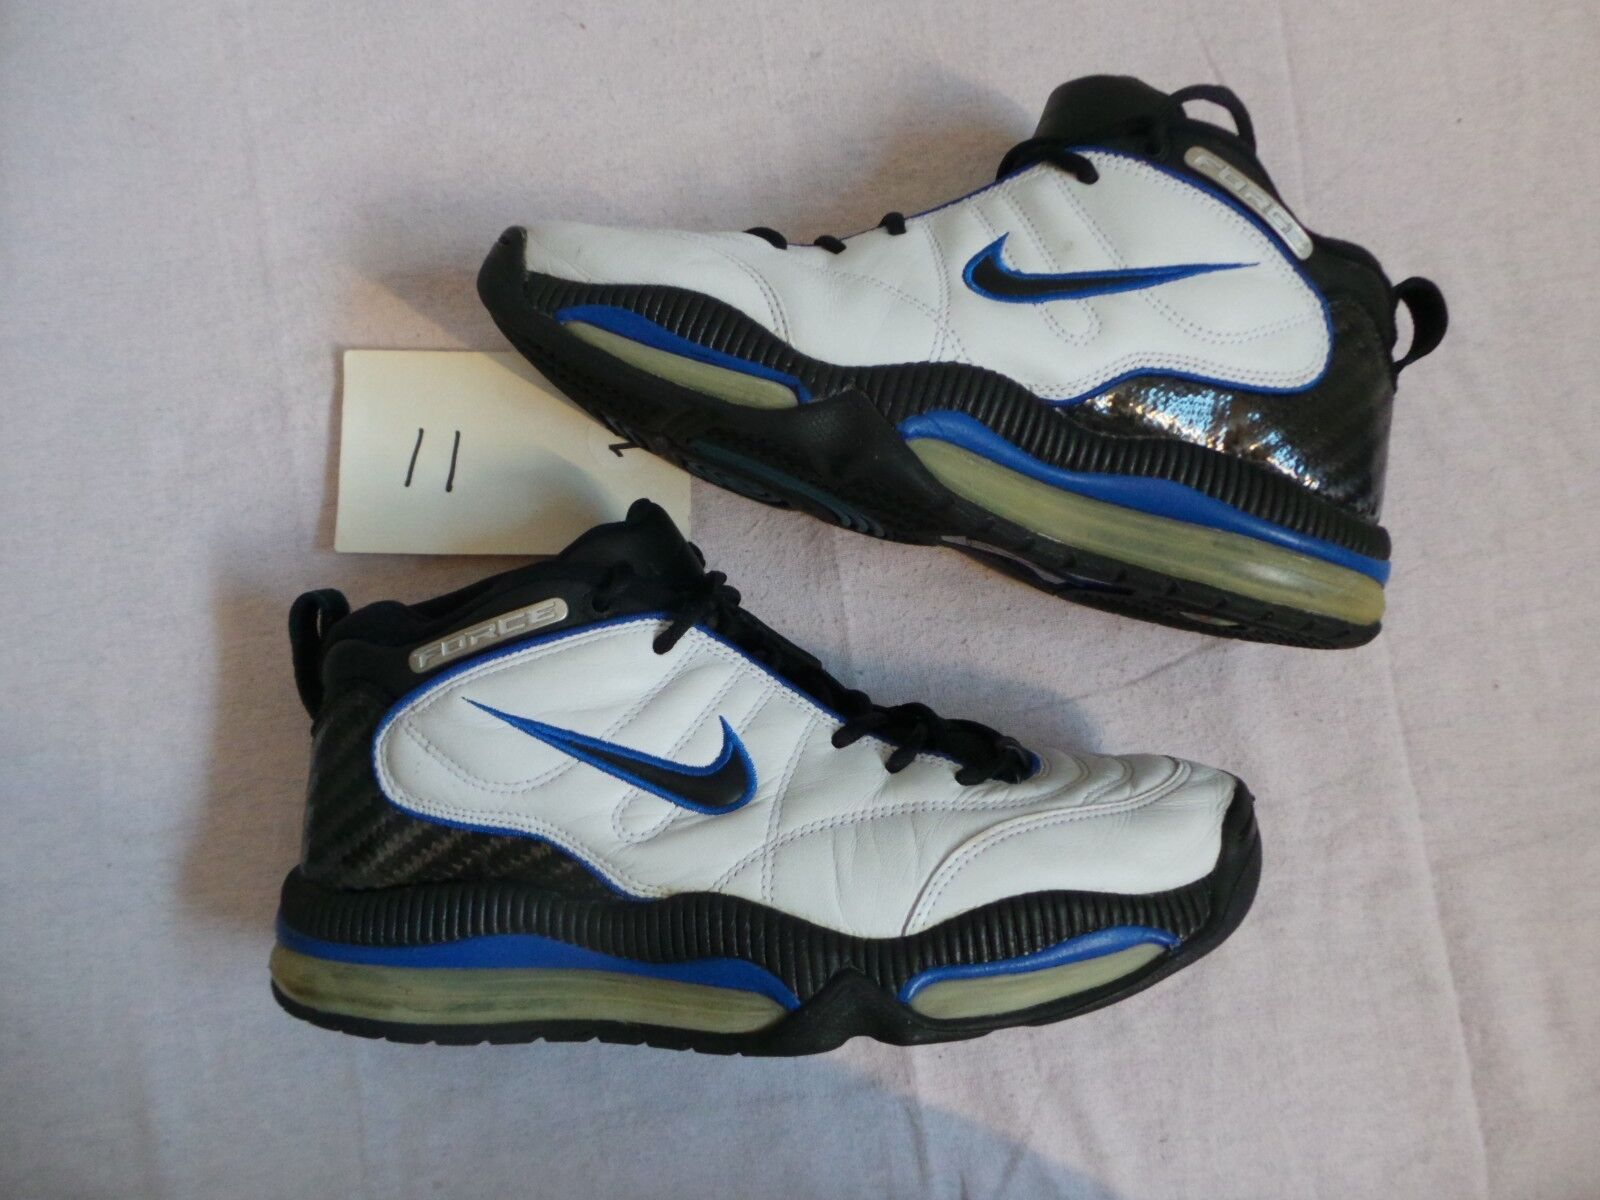 Nike Air total agreden la fuerza S 11 og Vintage original 90 negro original Vintage Royal Blanco silvestres raras Casual Shoes 80fbf3